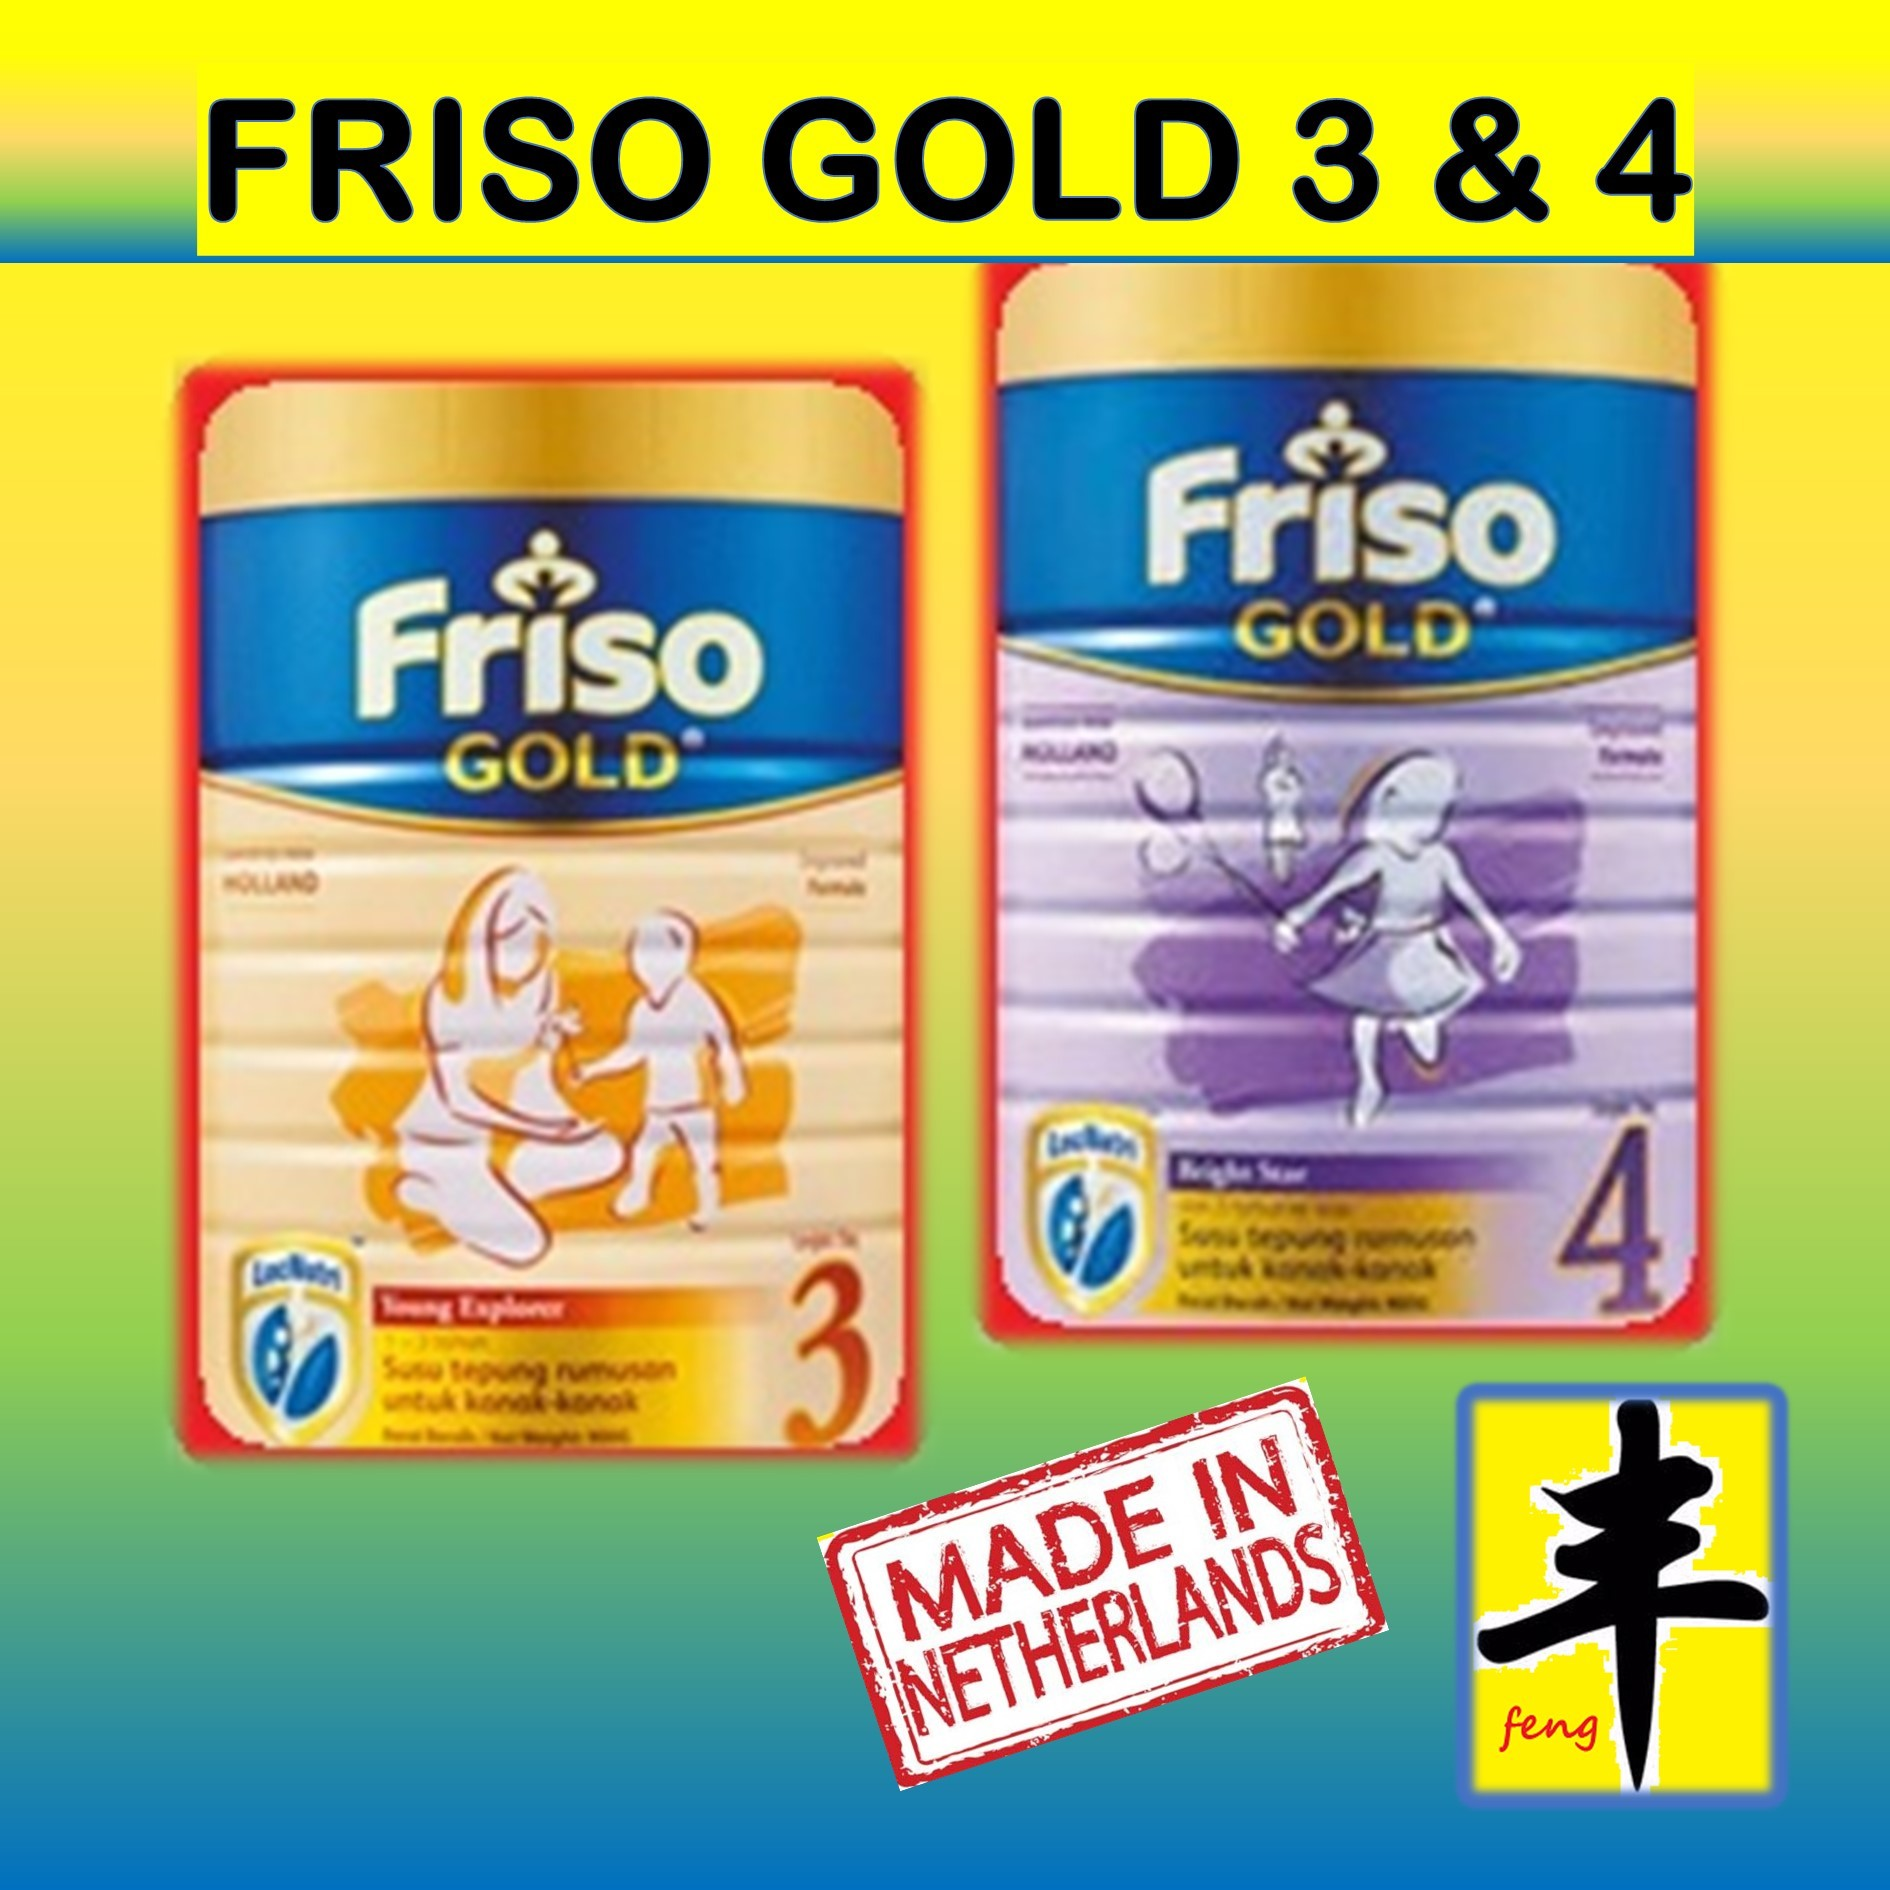 Mix Frisolak: reviews of doctors. Hypoallergenic Frisolac: reviews 30